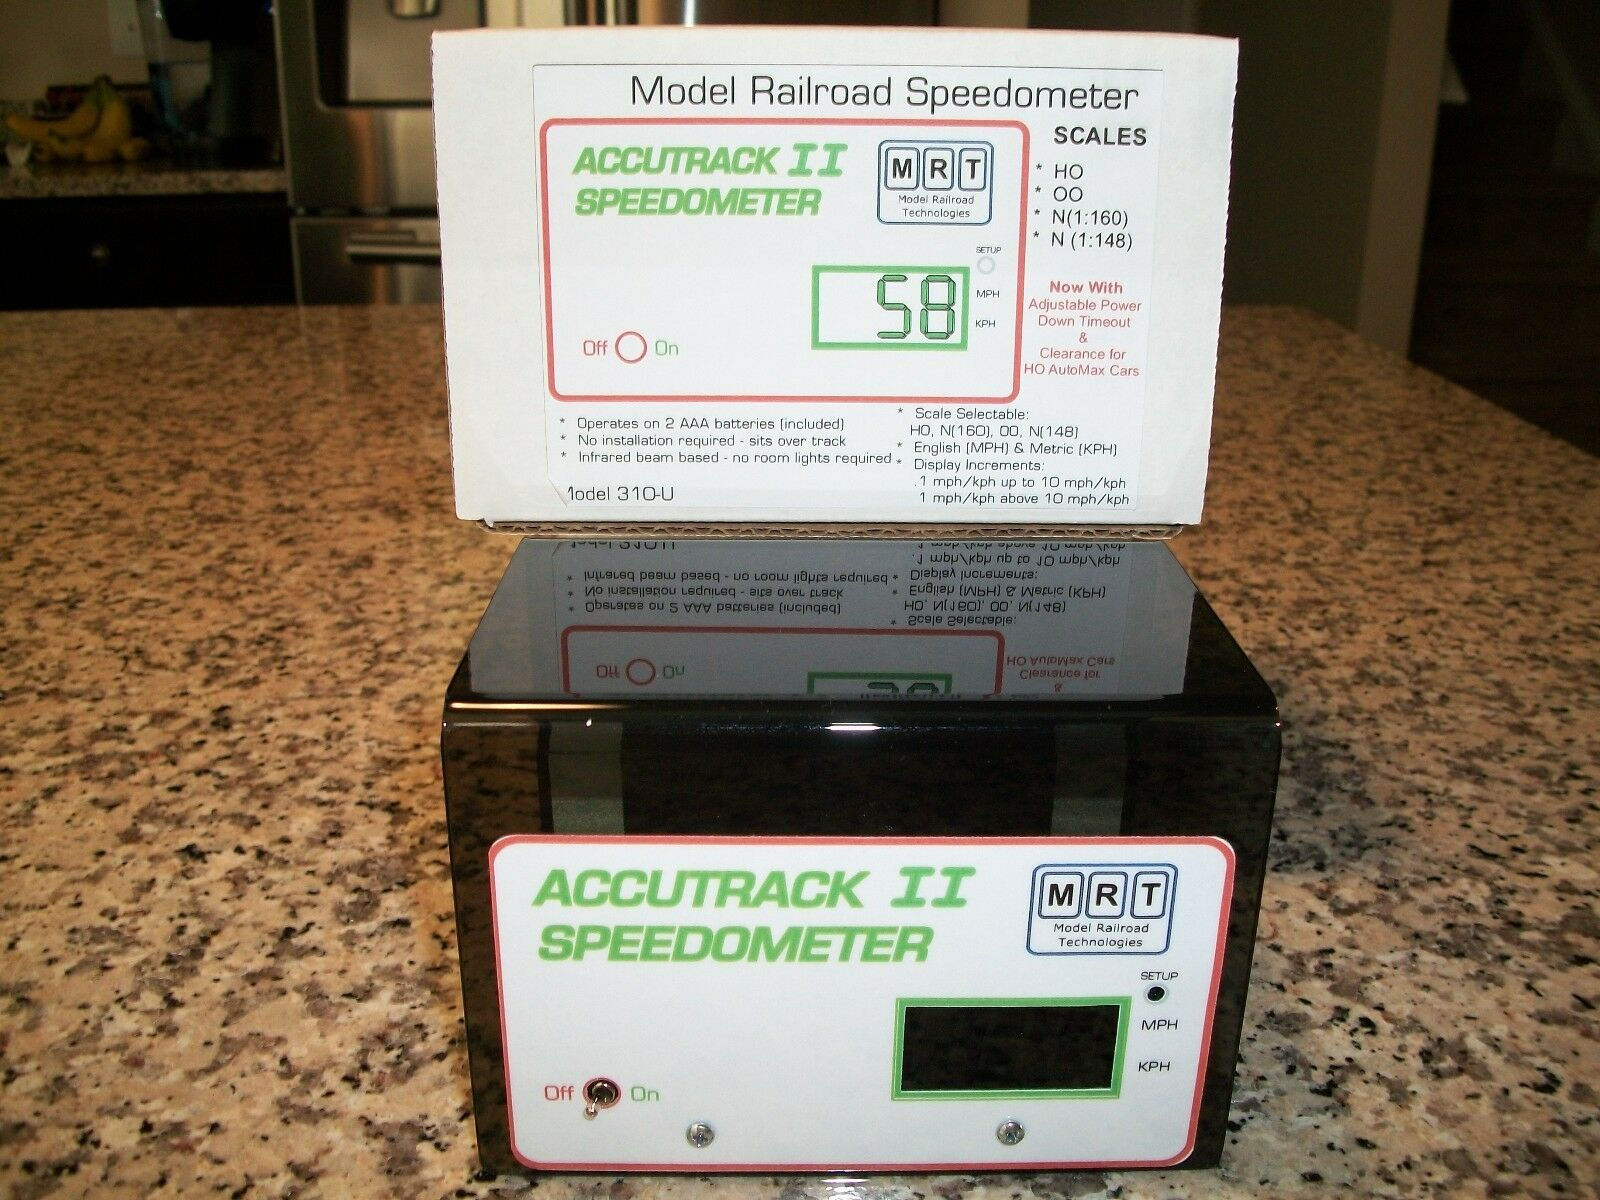 MRT Accutrack 2 Model Railroad Speedometer Newest Version   Bob The Train Guy